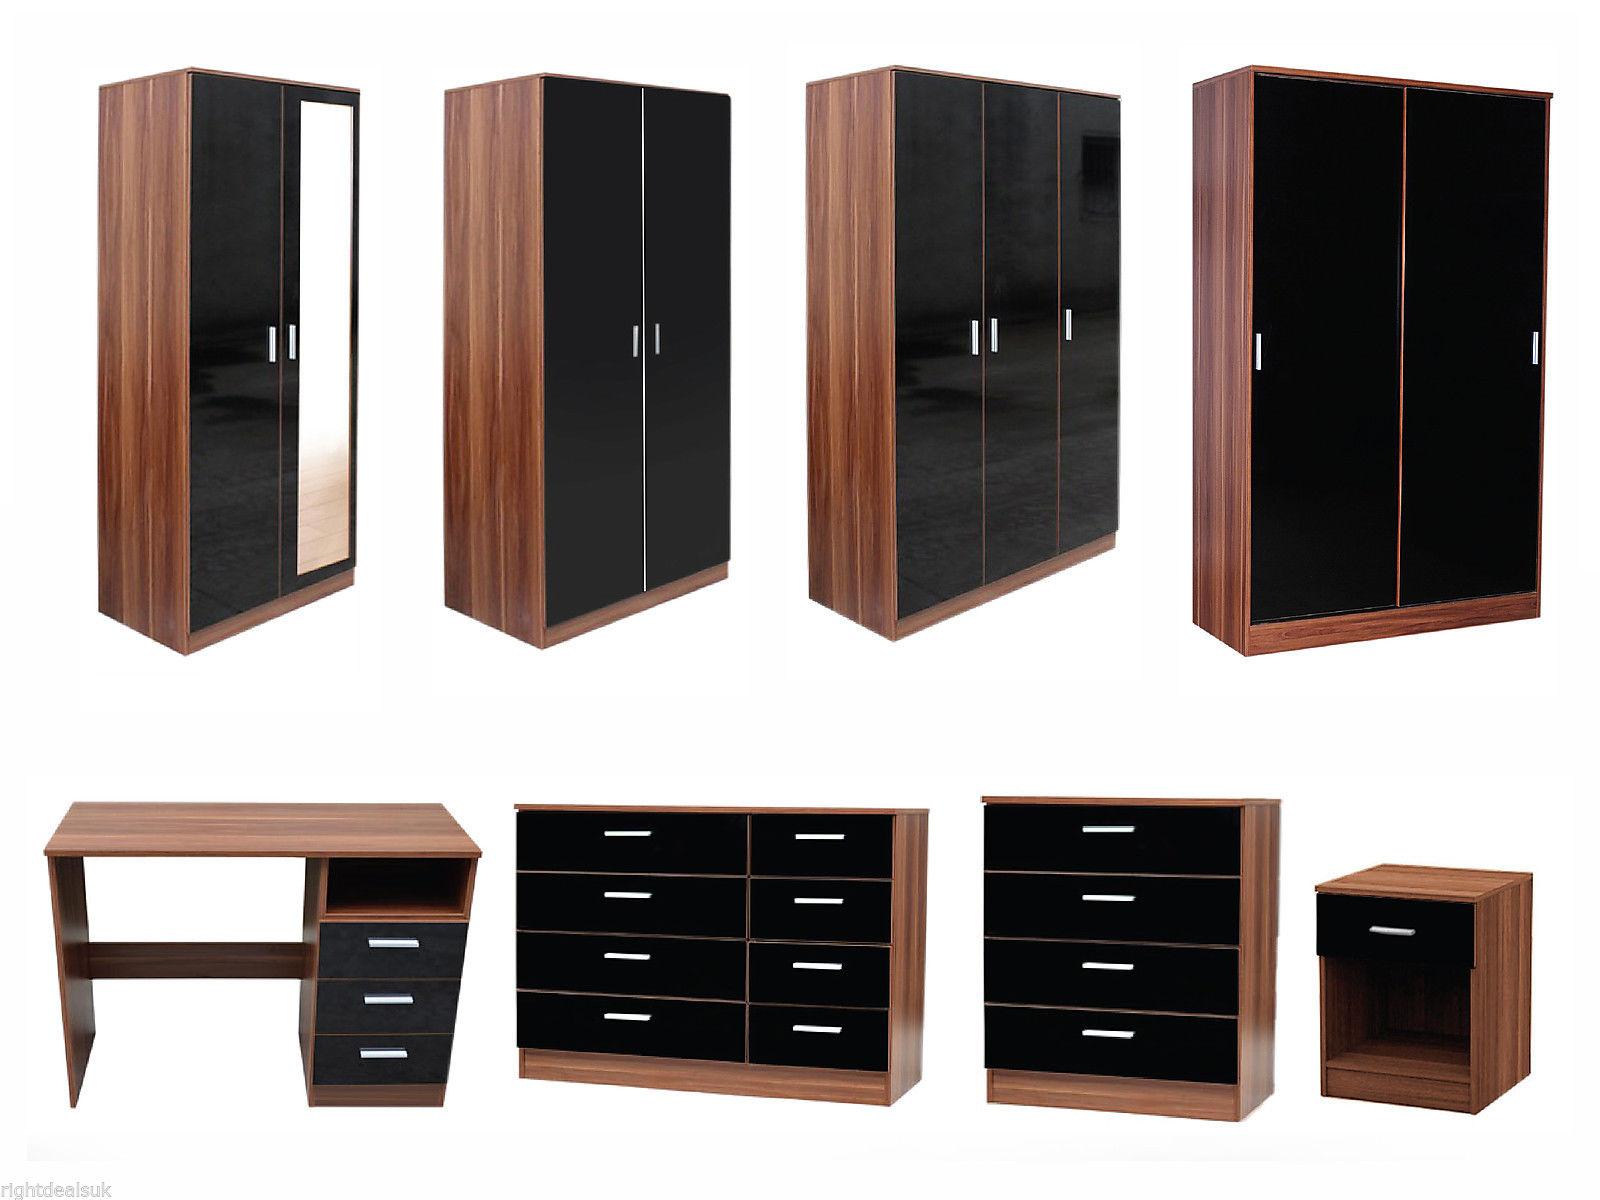 Peachy Details About New Caspian High Gloss Black Walnut Bedroom Furniture Set Full Supreme Range Complete Home Design Collection Epsylindsey Bellcom